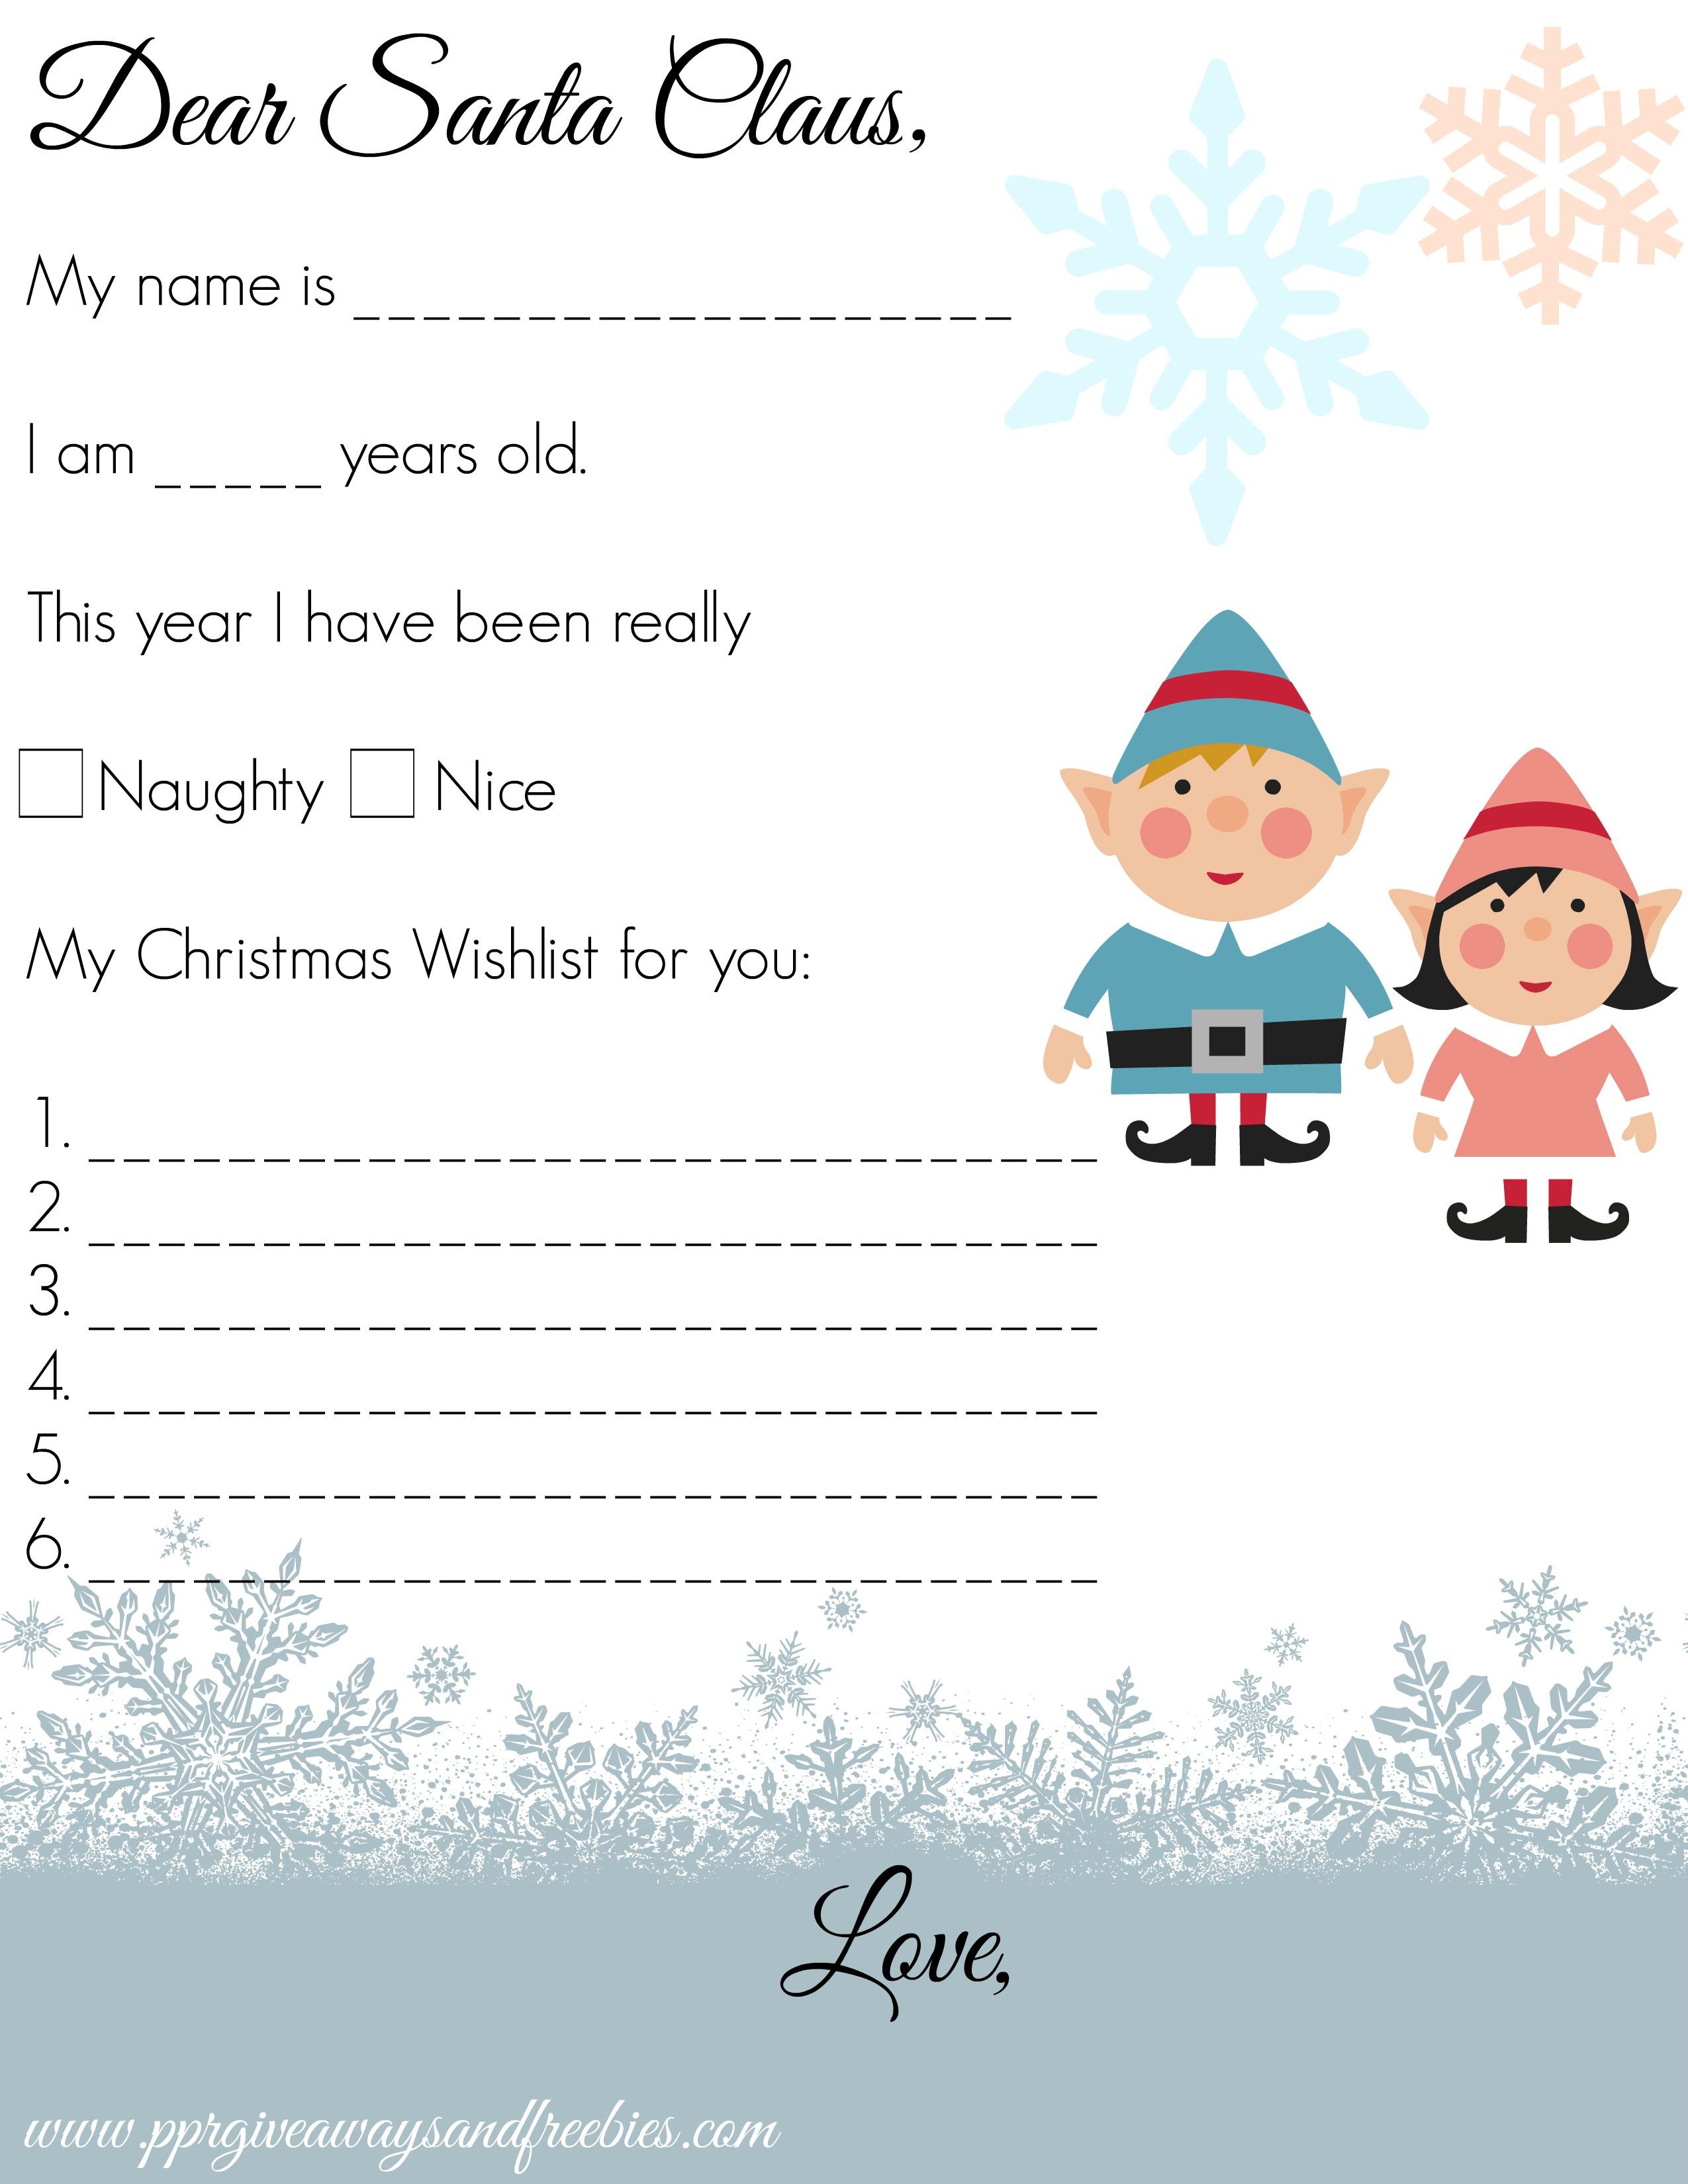 Dear Santa Letter – Free Printable